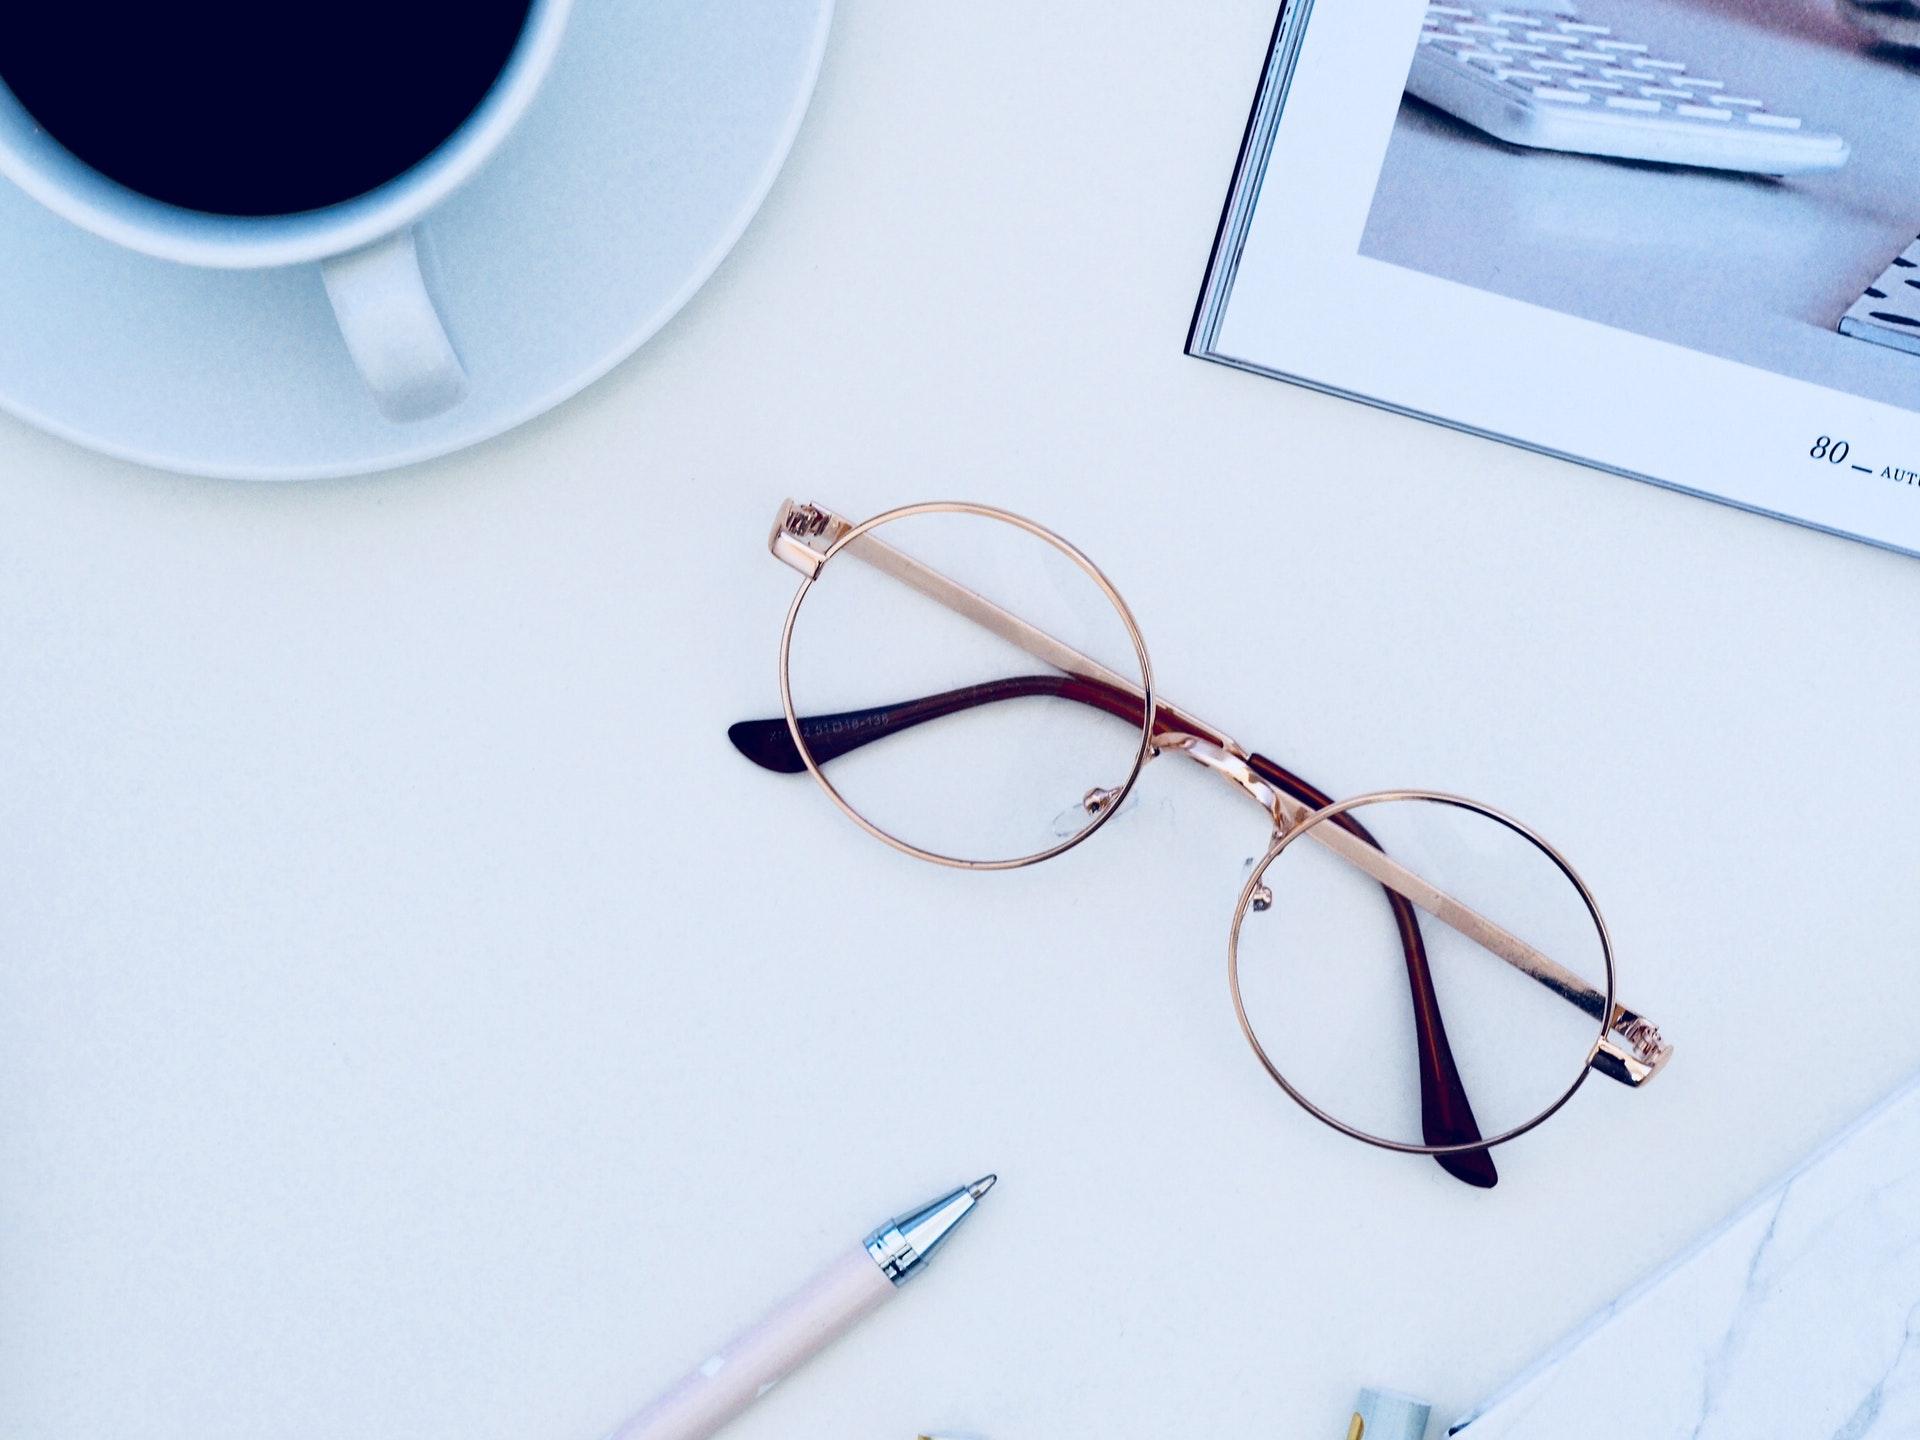 billigbrillen-skaermbriller-uden-styrke